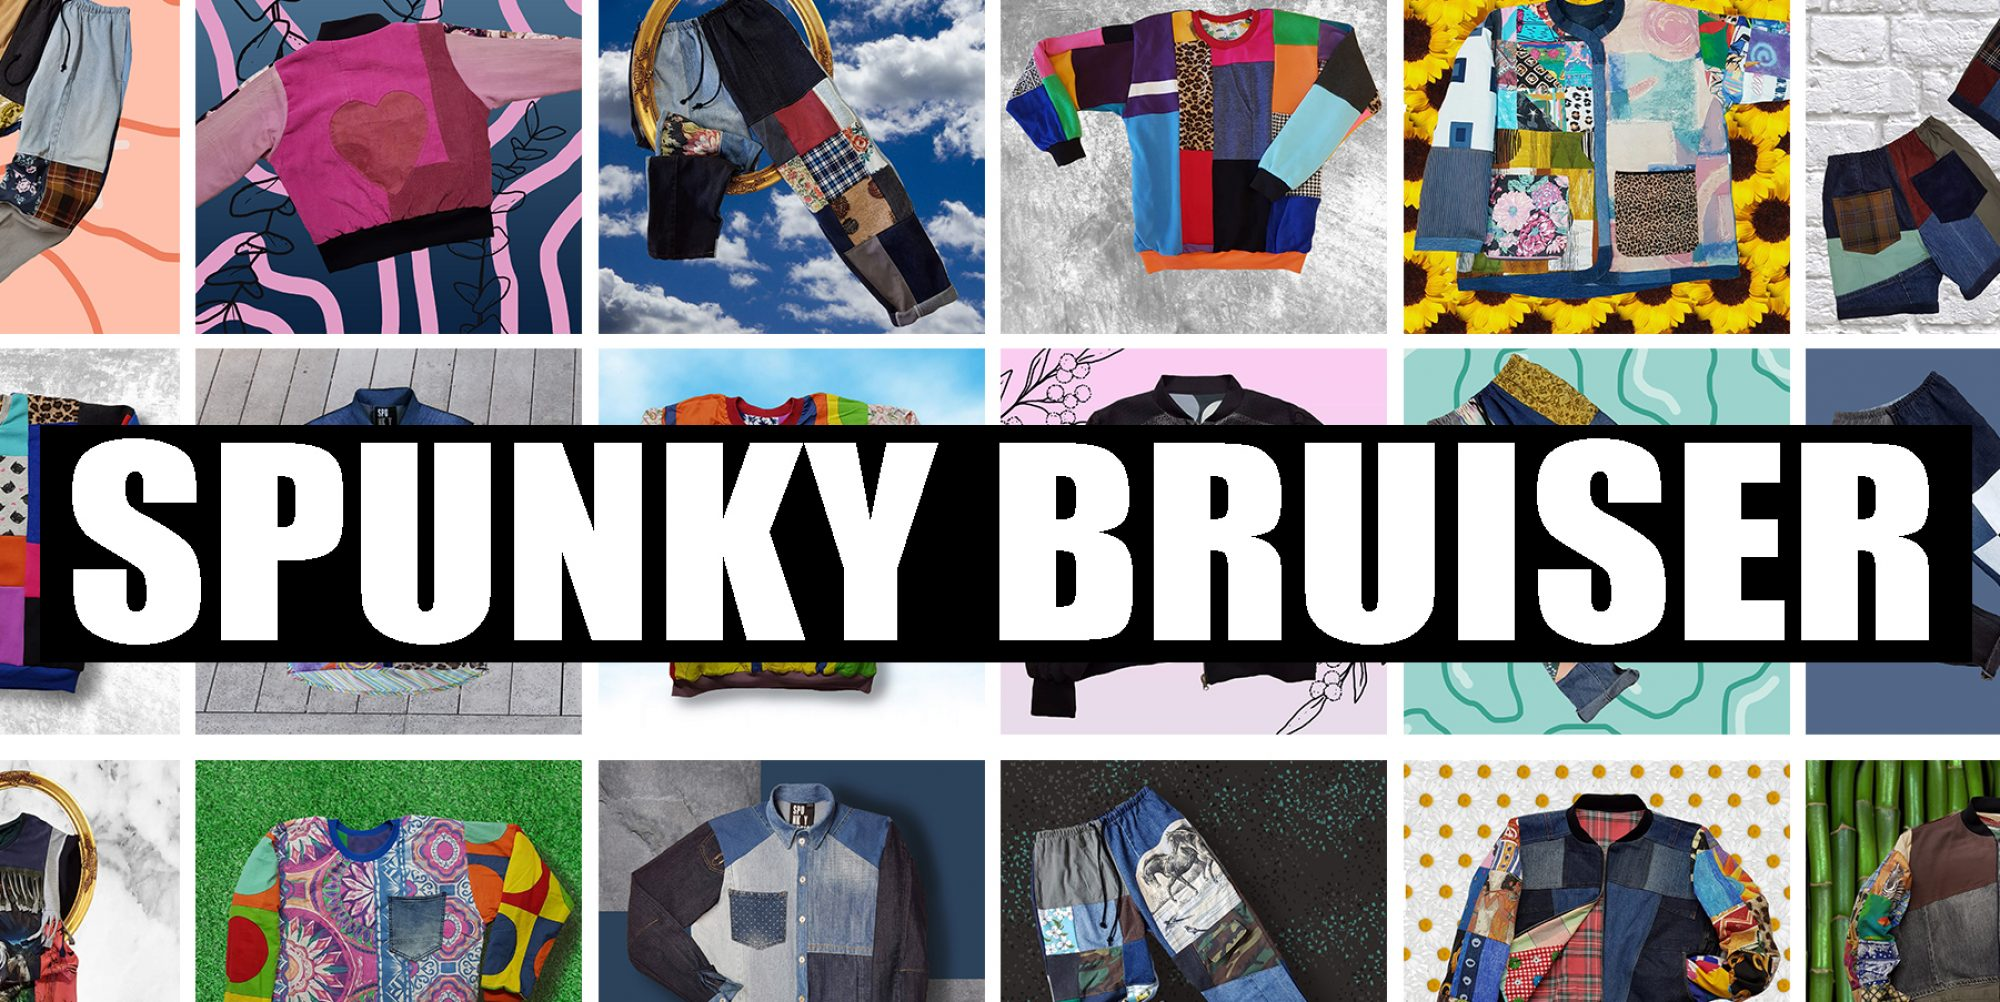 Spunky Bruiser